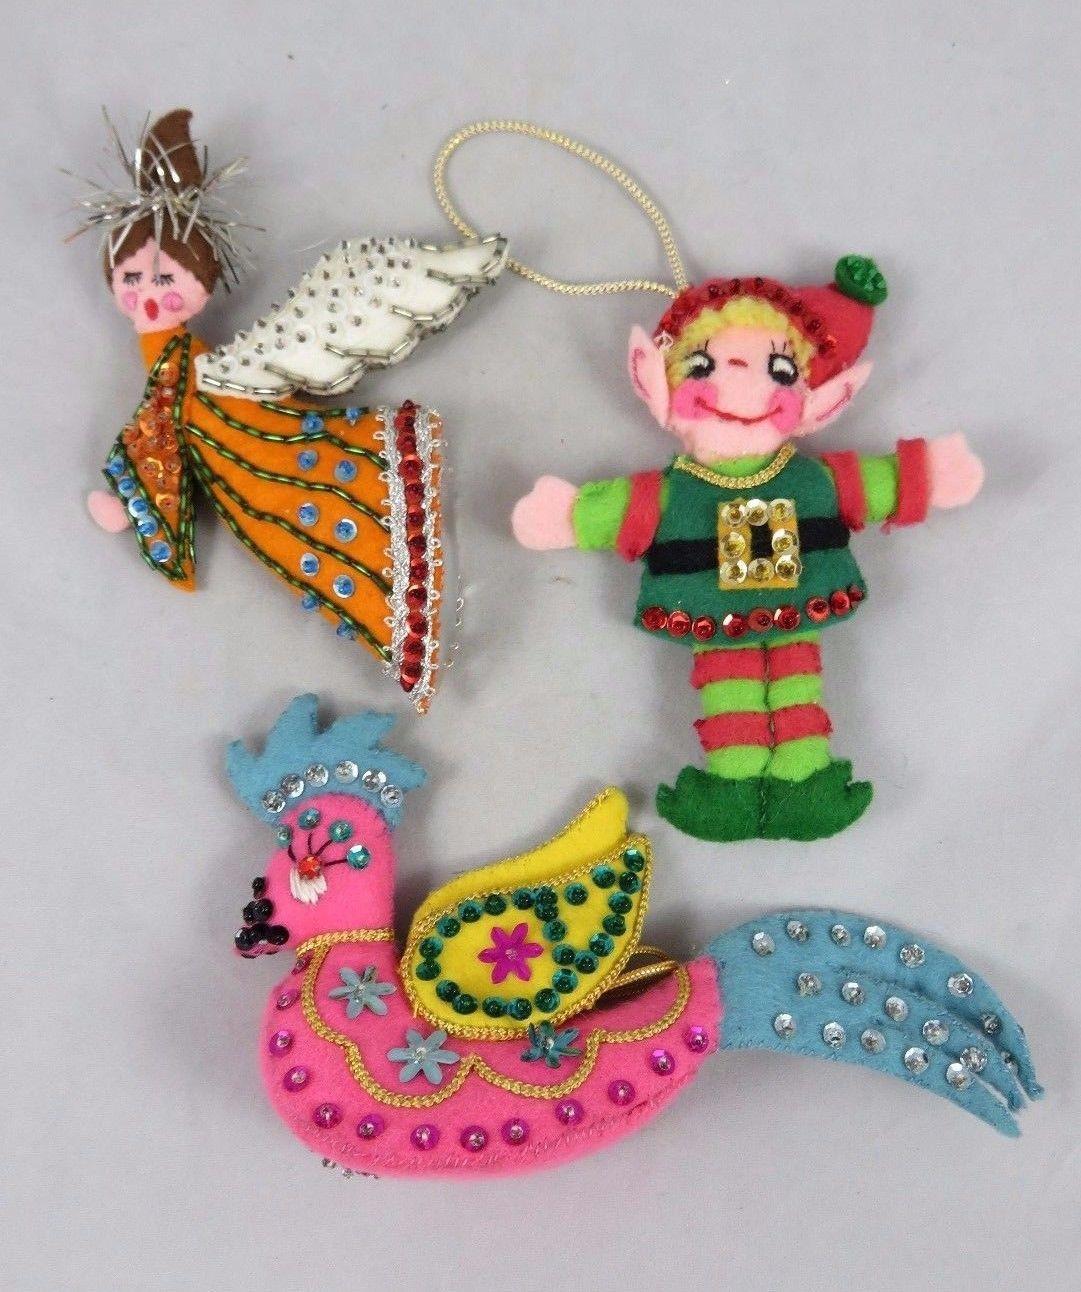 Vintage Christmas Ornaments Handmade With Felt Sequins And Beads Angel Bird Elf Christmas Ornaments Modern Christmas Ornaments Felt Ornaments